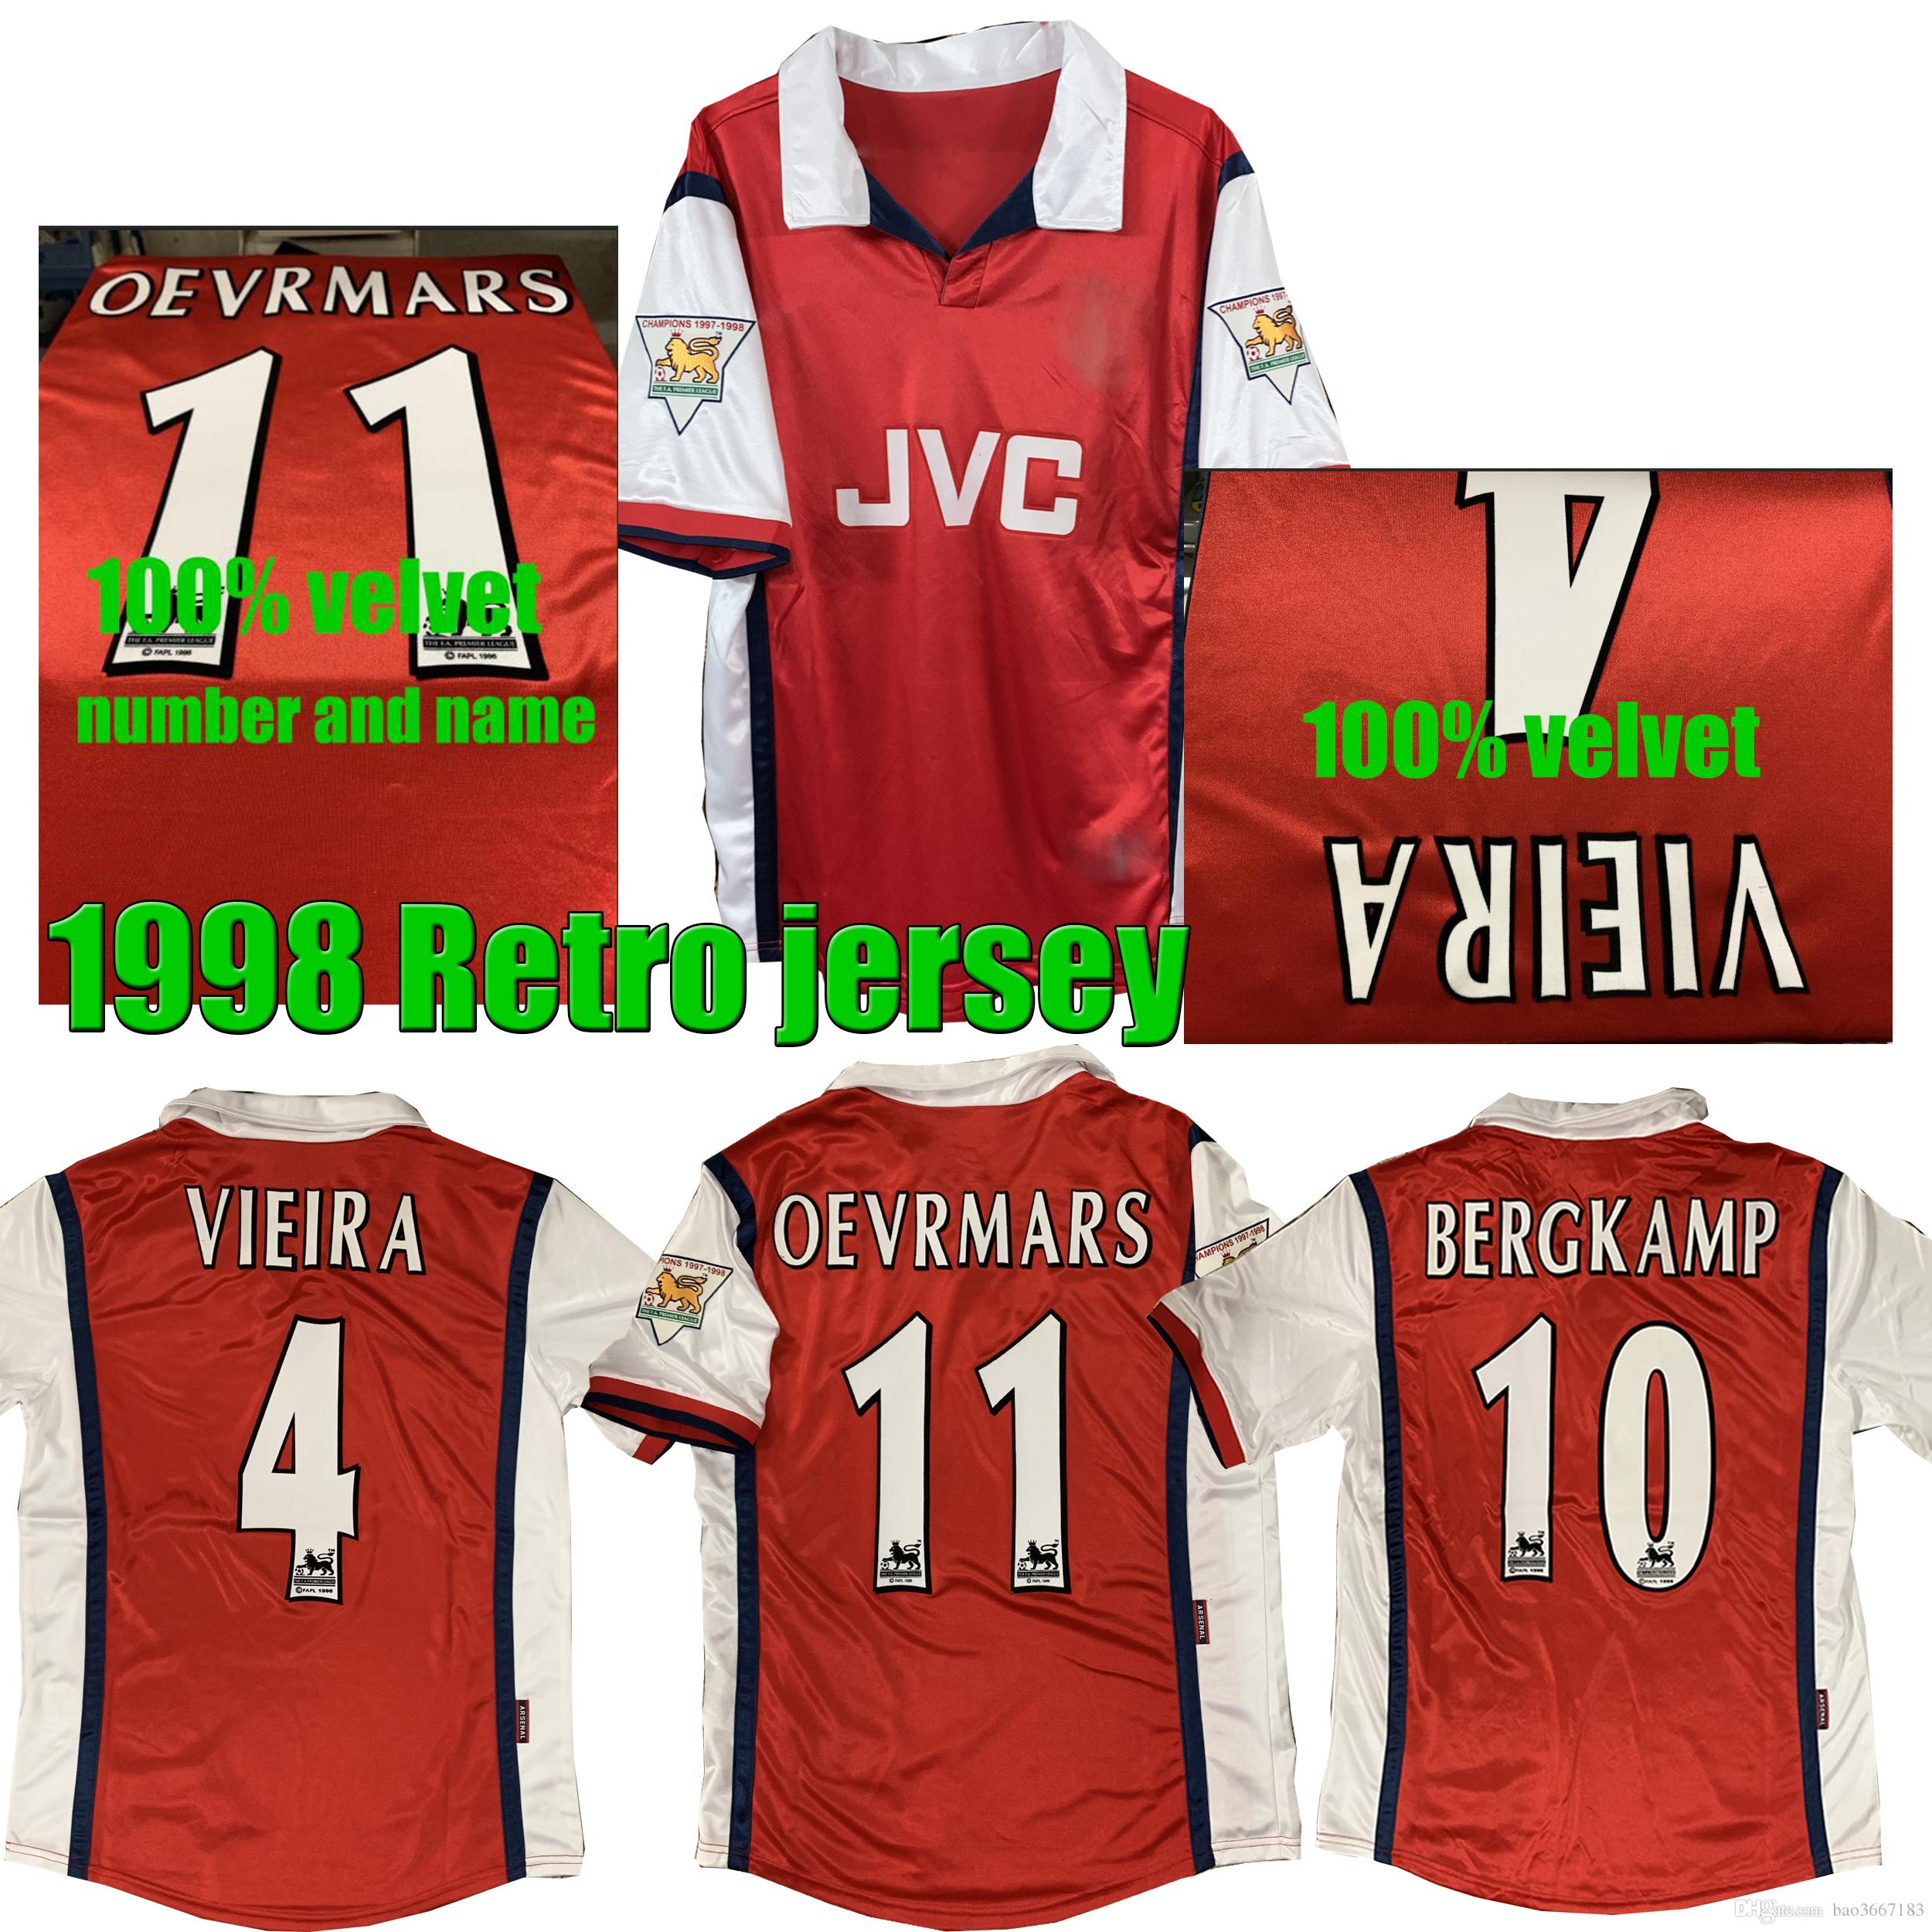 6f97c0dfbe5 1998 BERGKAMP VIEIRA Retro Soccer Jersey Bergkamp Anelka OEVRMARS 1998  Legendary Retro Football Shirt Retro Soccer Jersey BERGKAMP VIEIRA Anelka  OEVRMARS ...